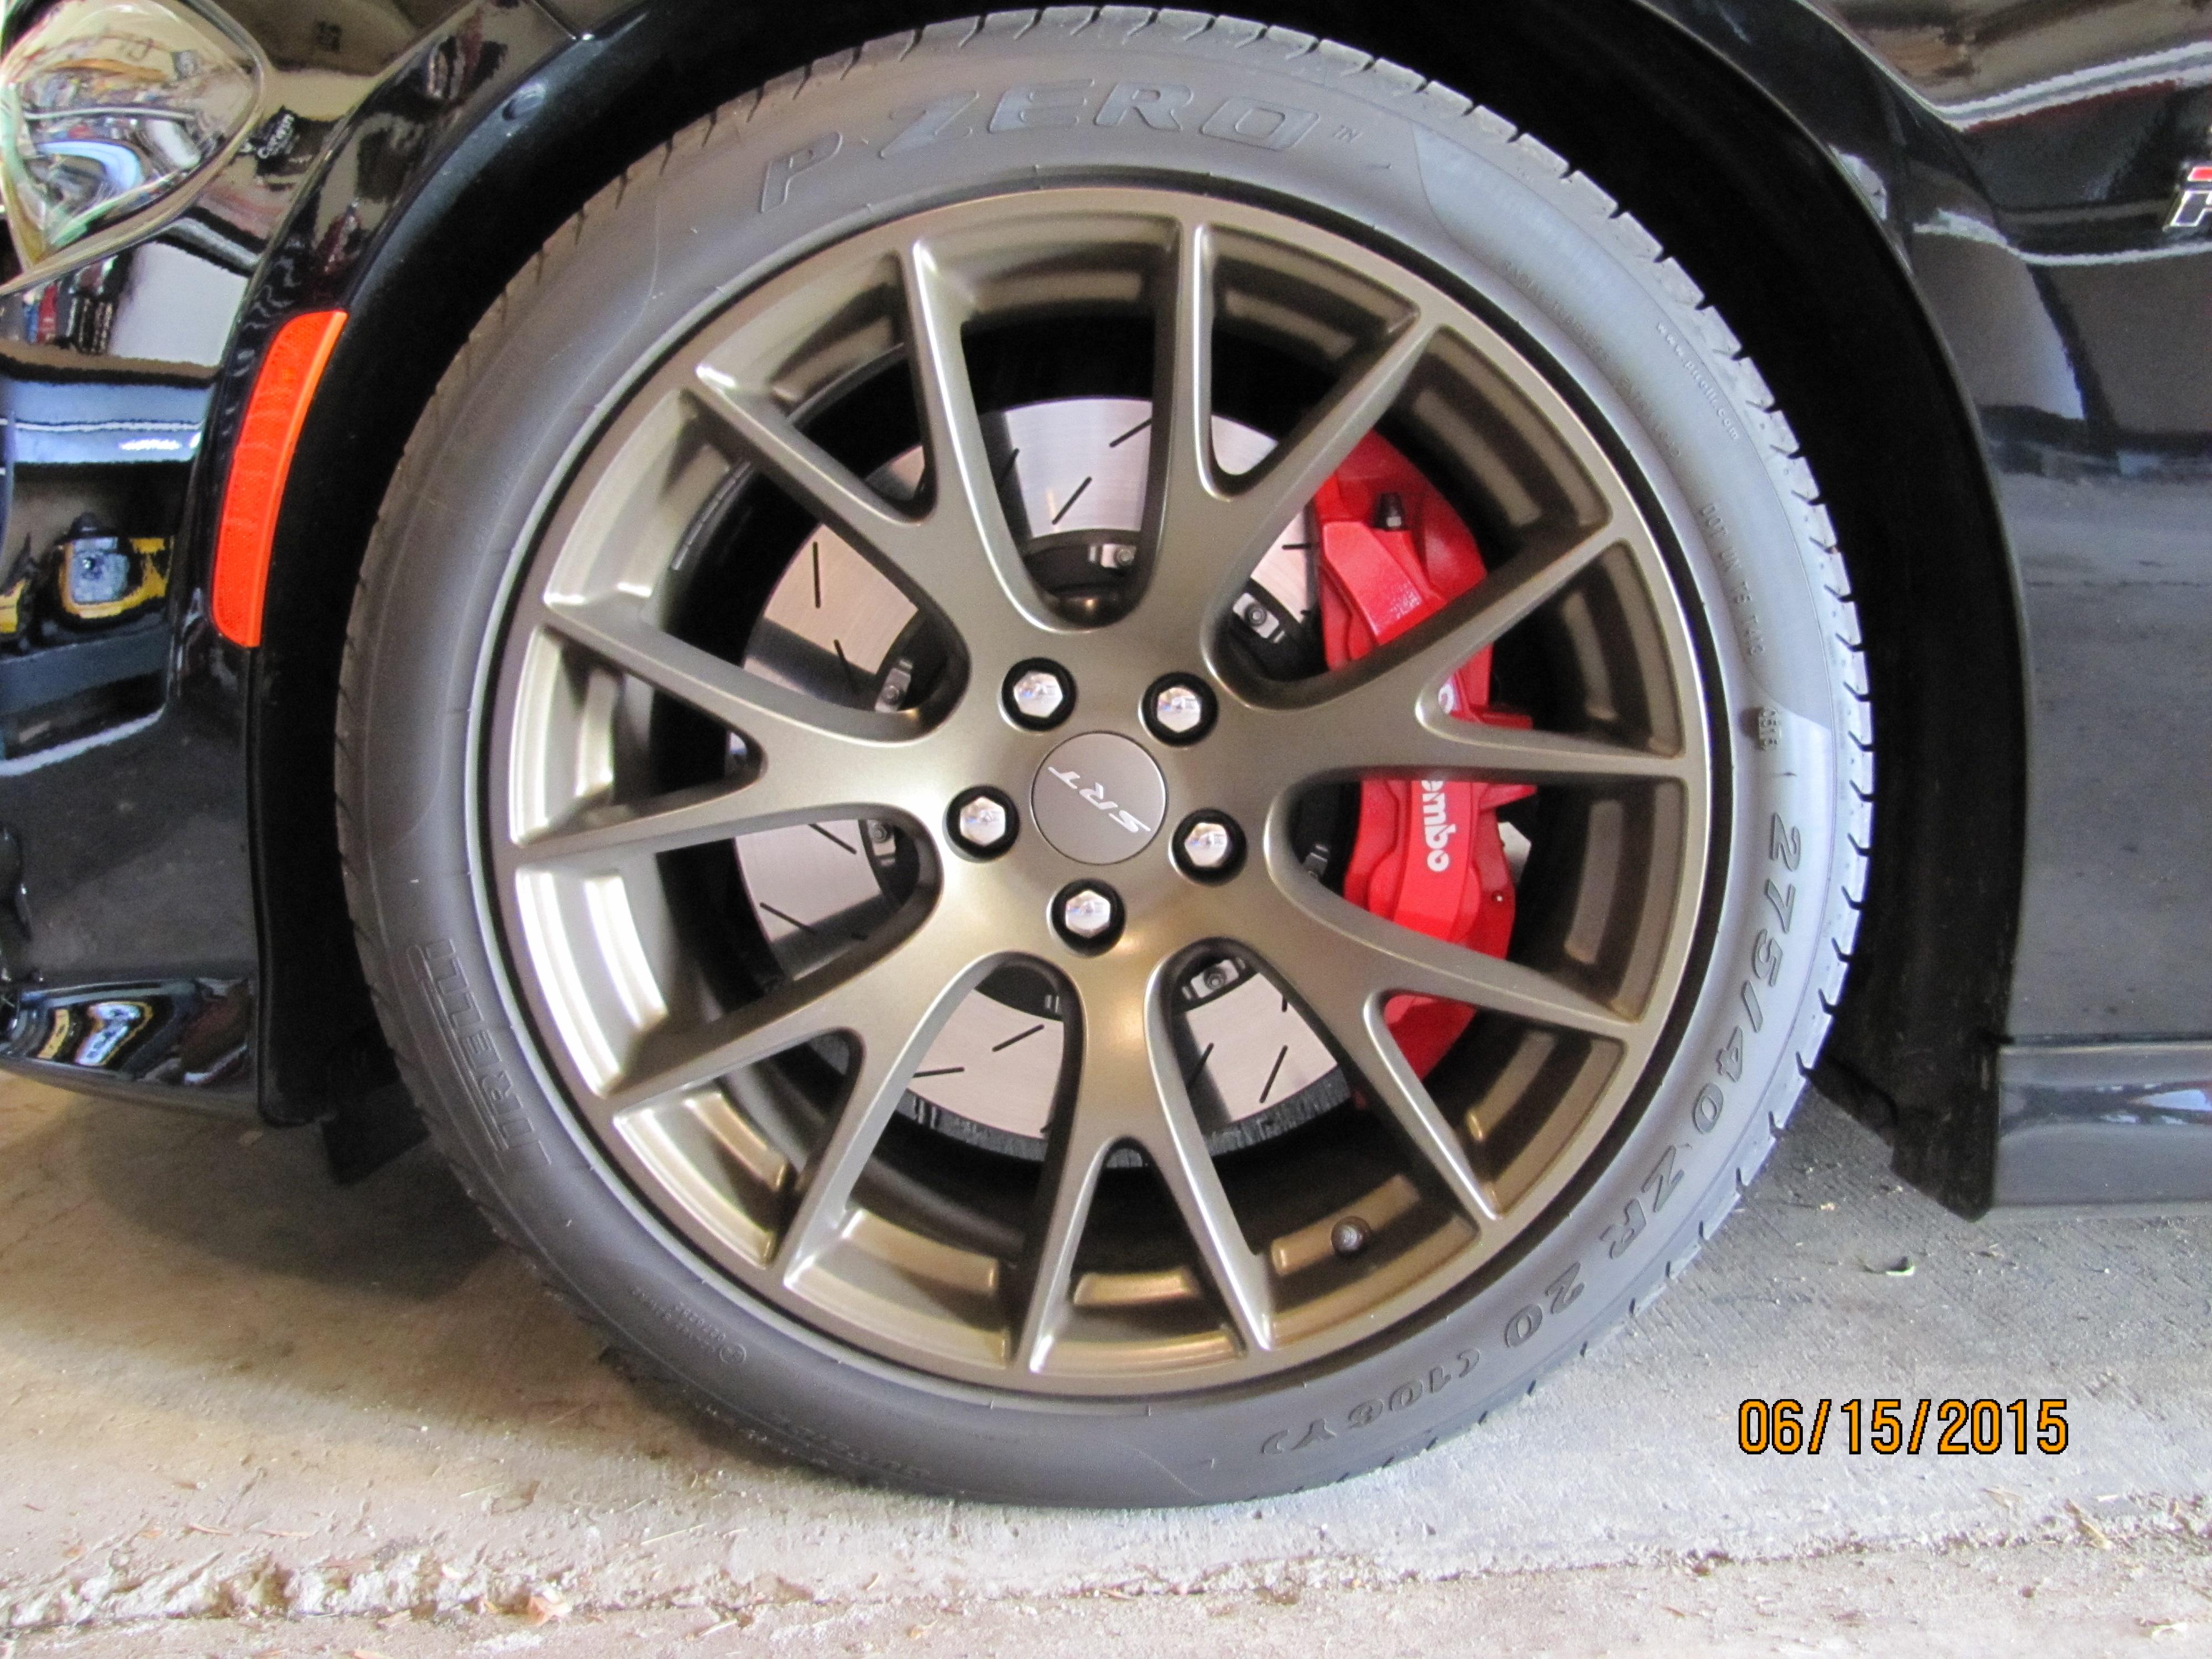 Wheel touch up paint | SRT Hellcat Forum